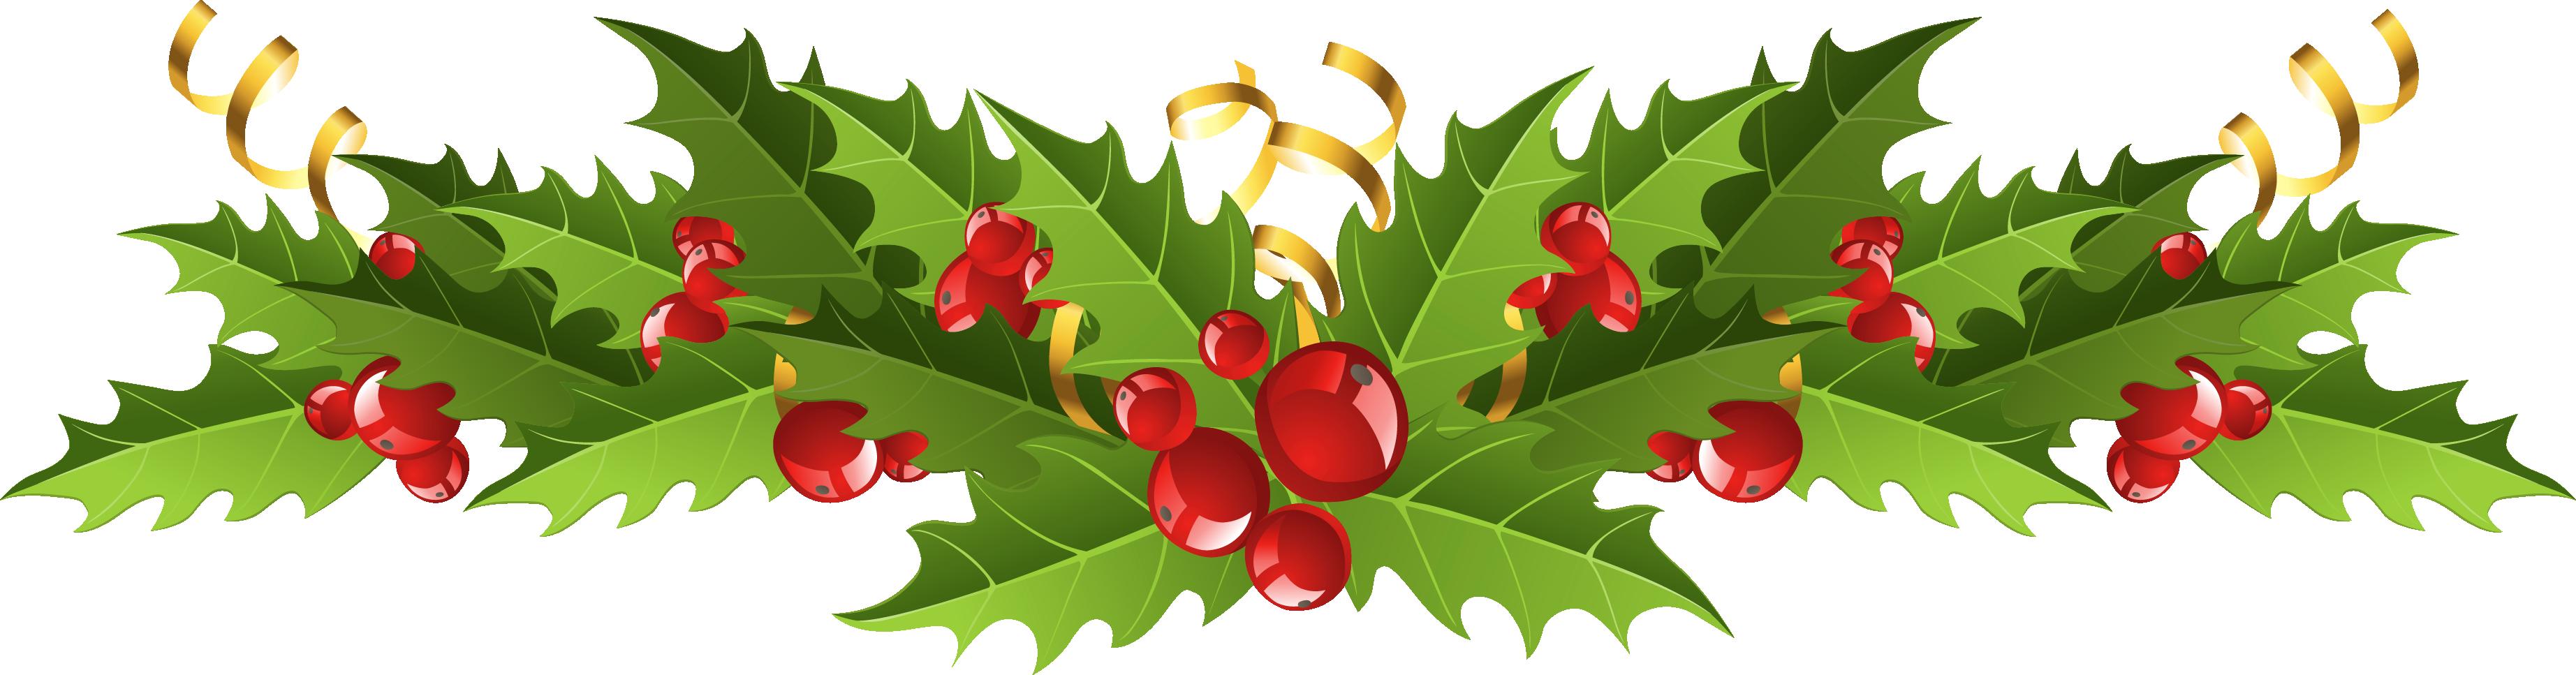 Transparent Christmas Mistletoe Decor Png Picture Diy Christmas Tree Ornaments Christmas Tree Clipart Christmas Wallpaper